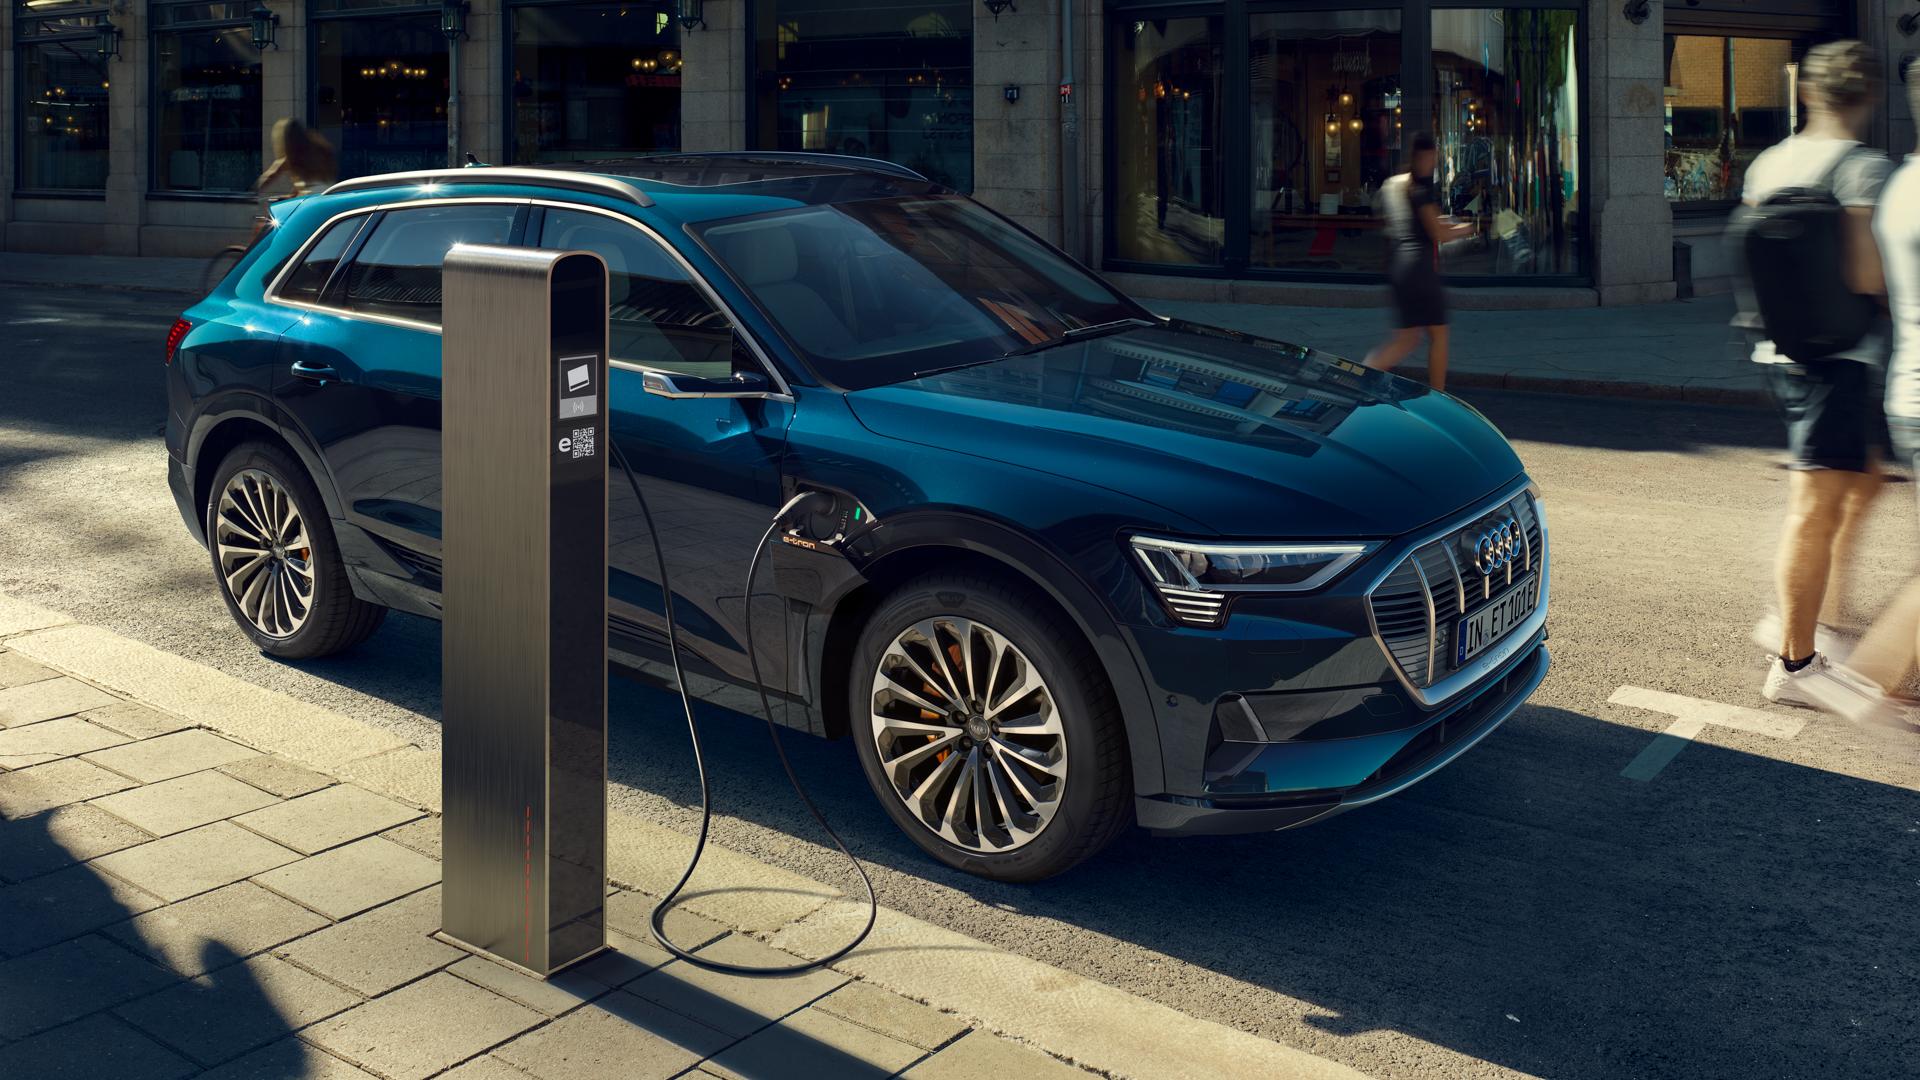 Os 20 carros elétricos e híbridos plug-in mais vendidos da Europa